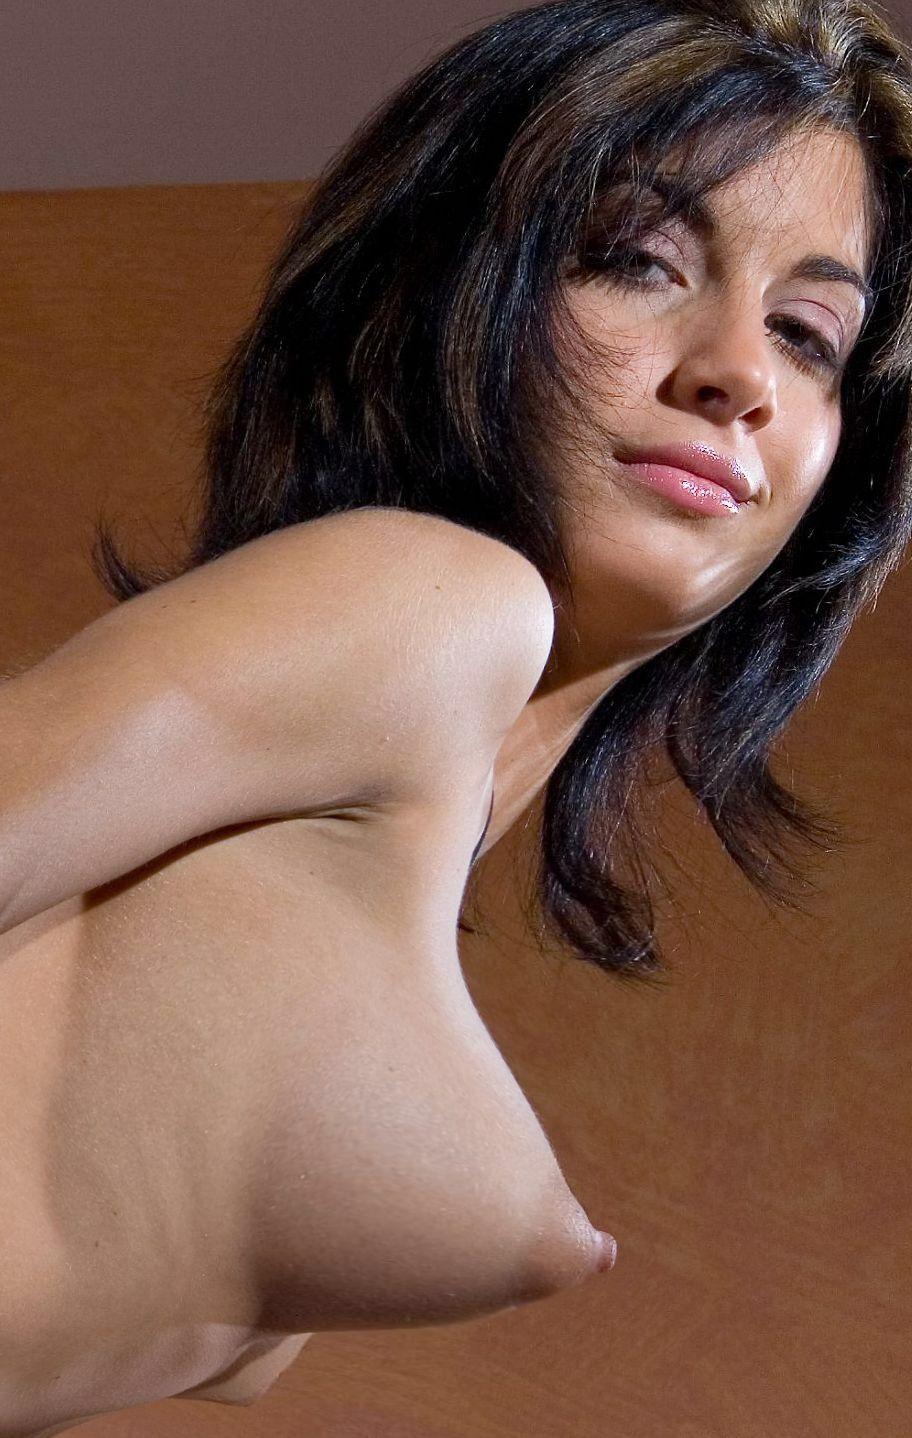 erect nips, puffy nips, pointy nips nips-alert.tumblr/archive